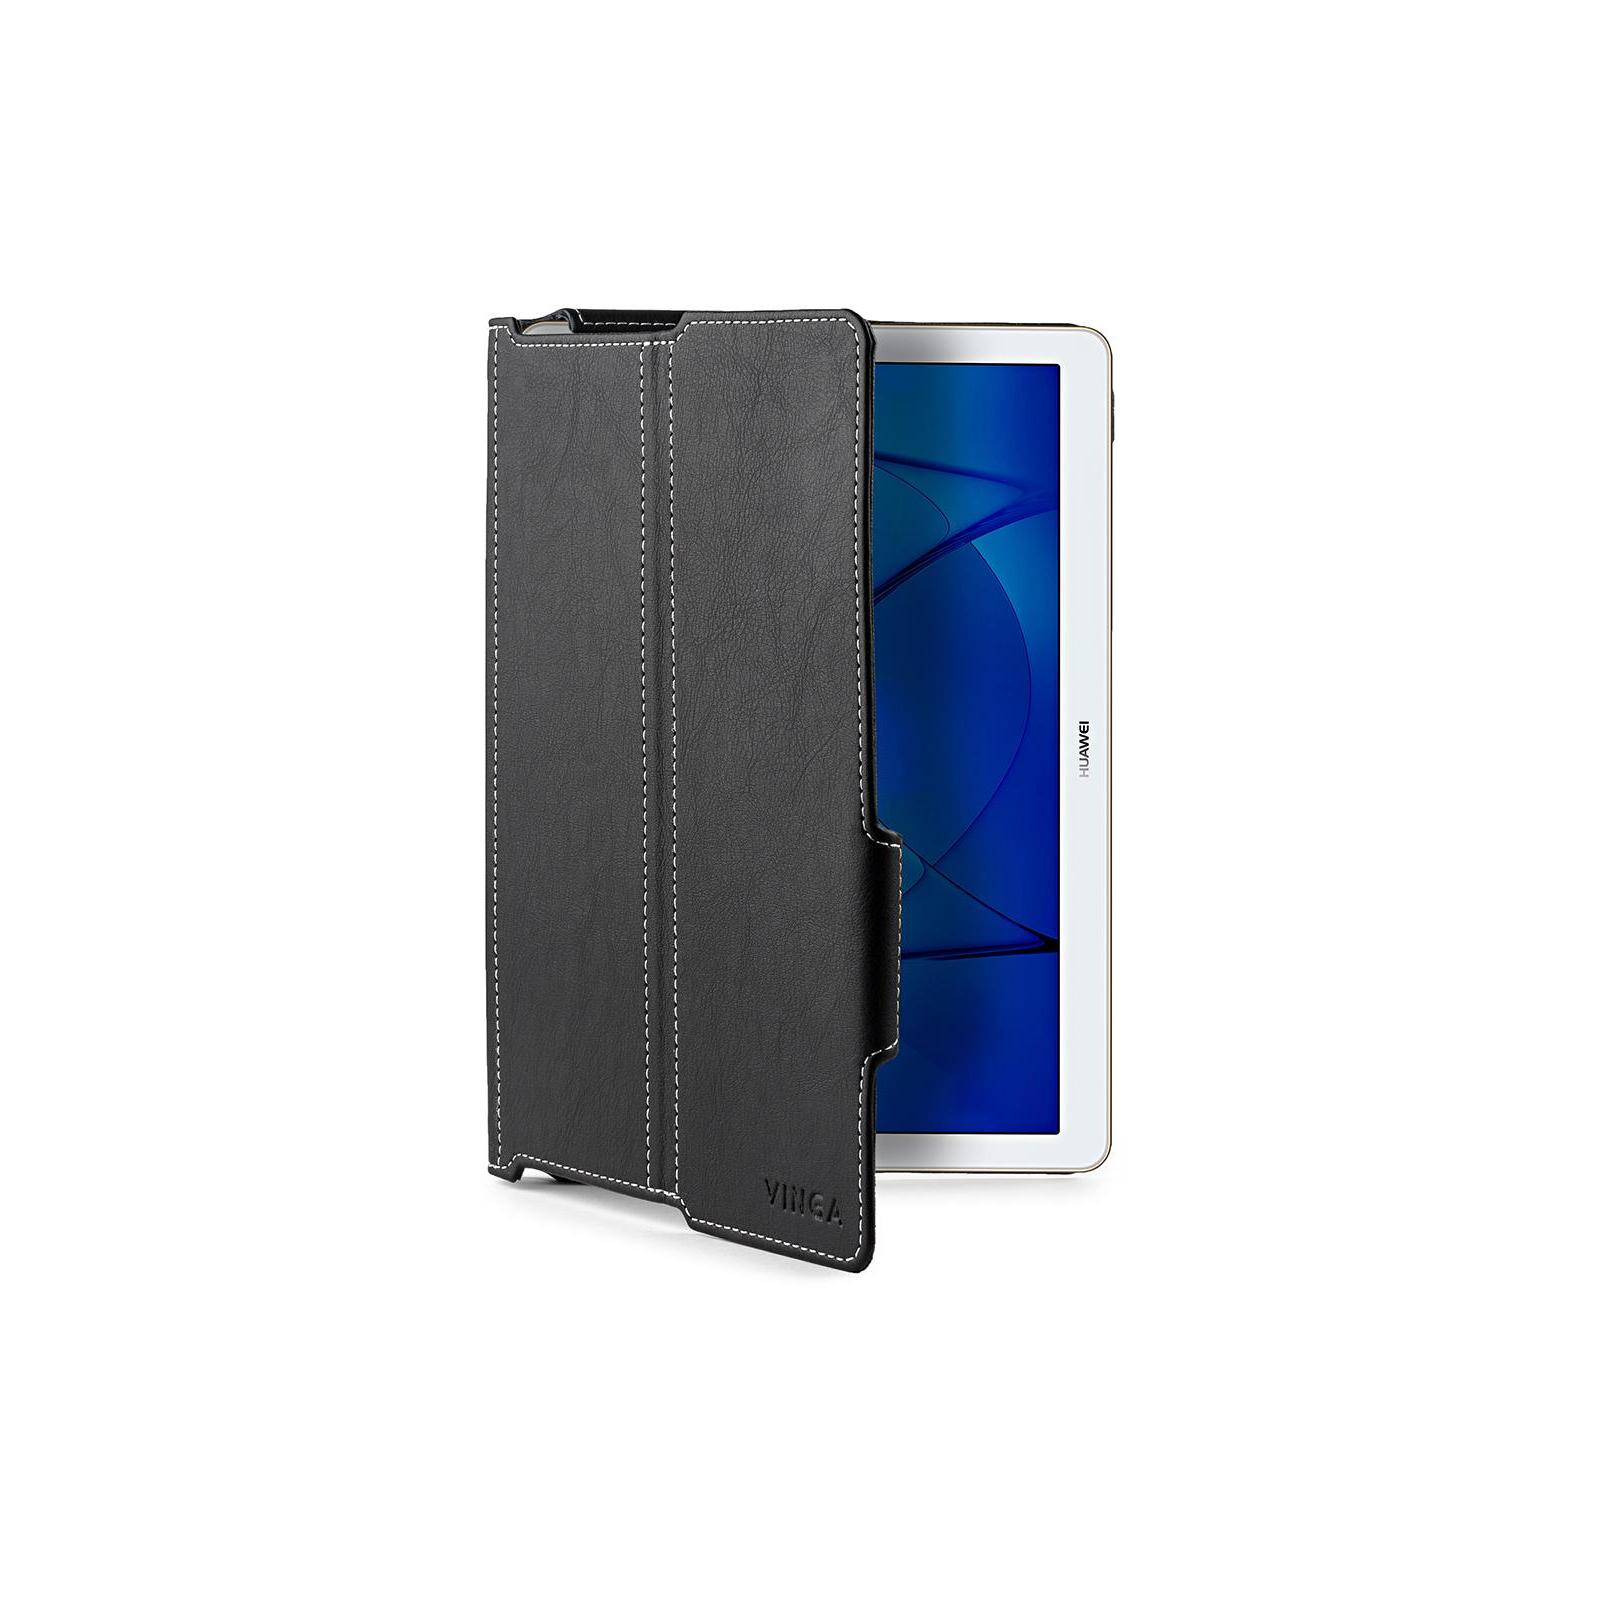 Чехол для планшета Huawei MediaPad T3 10 black Vinga (VNT3753010)